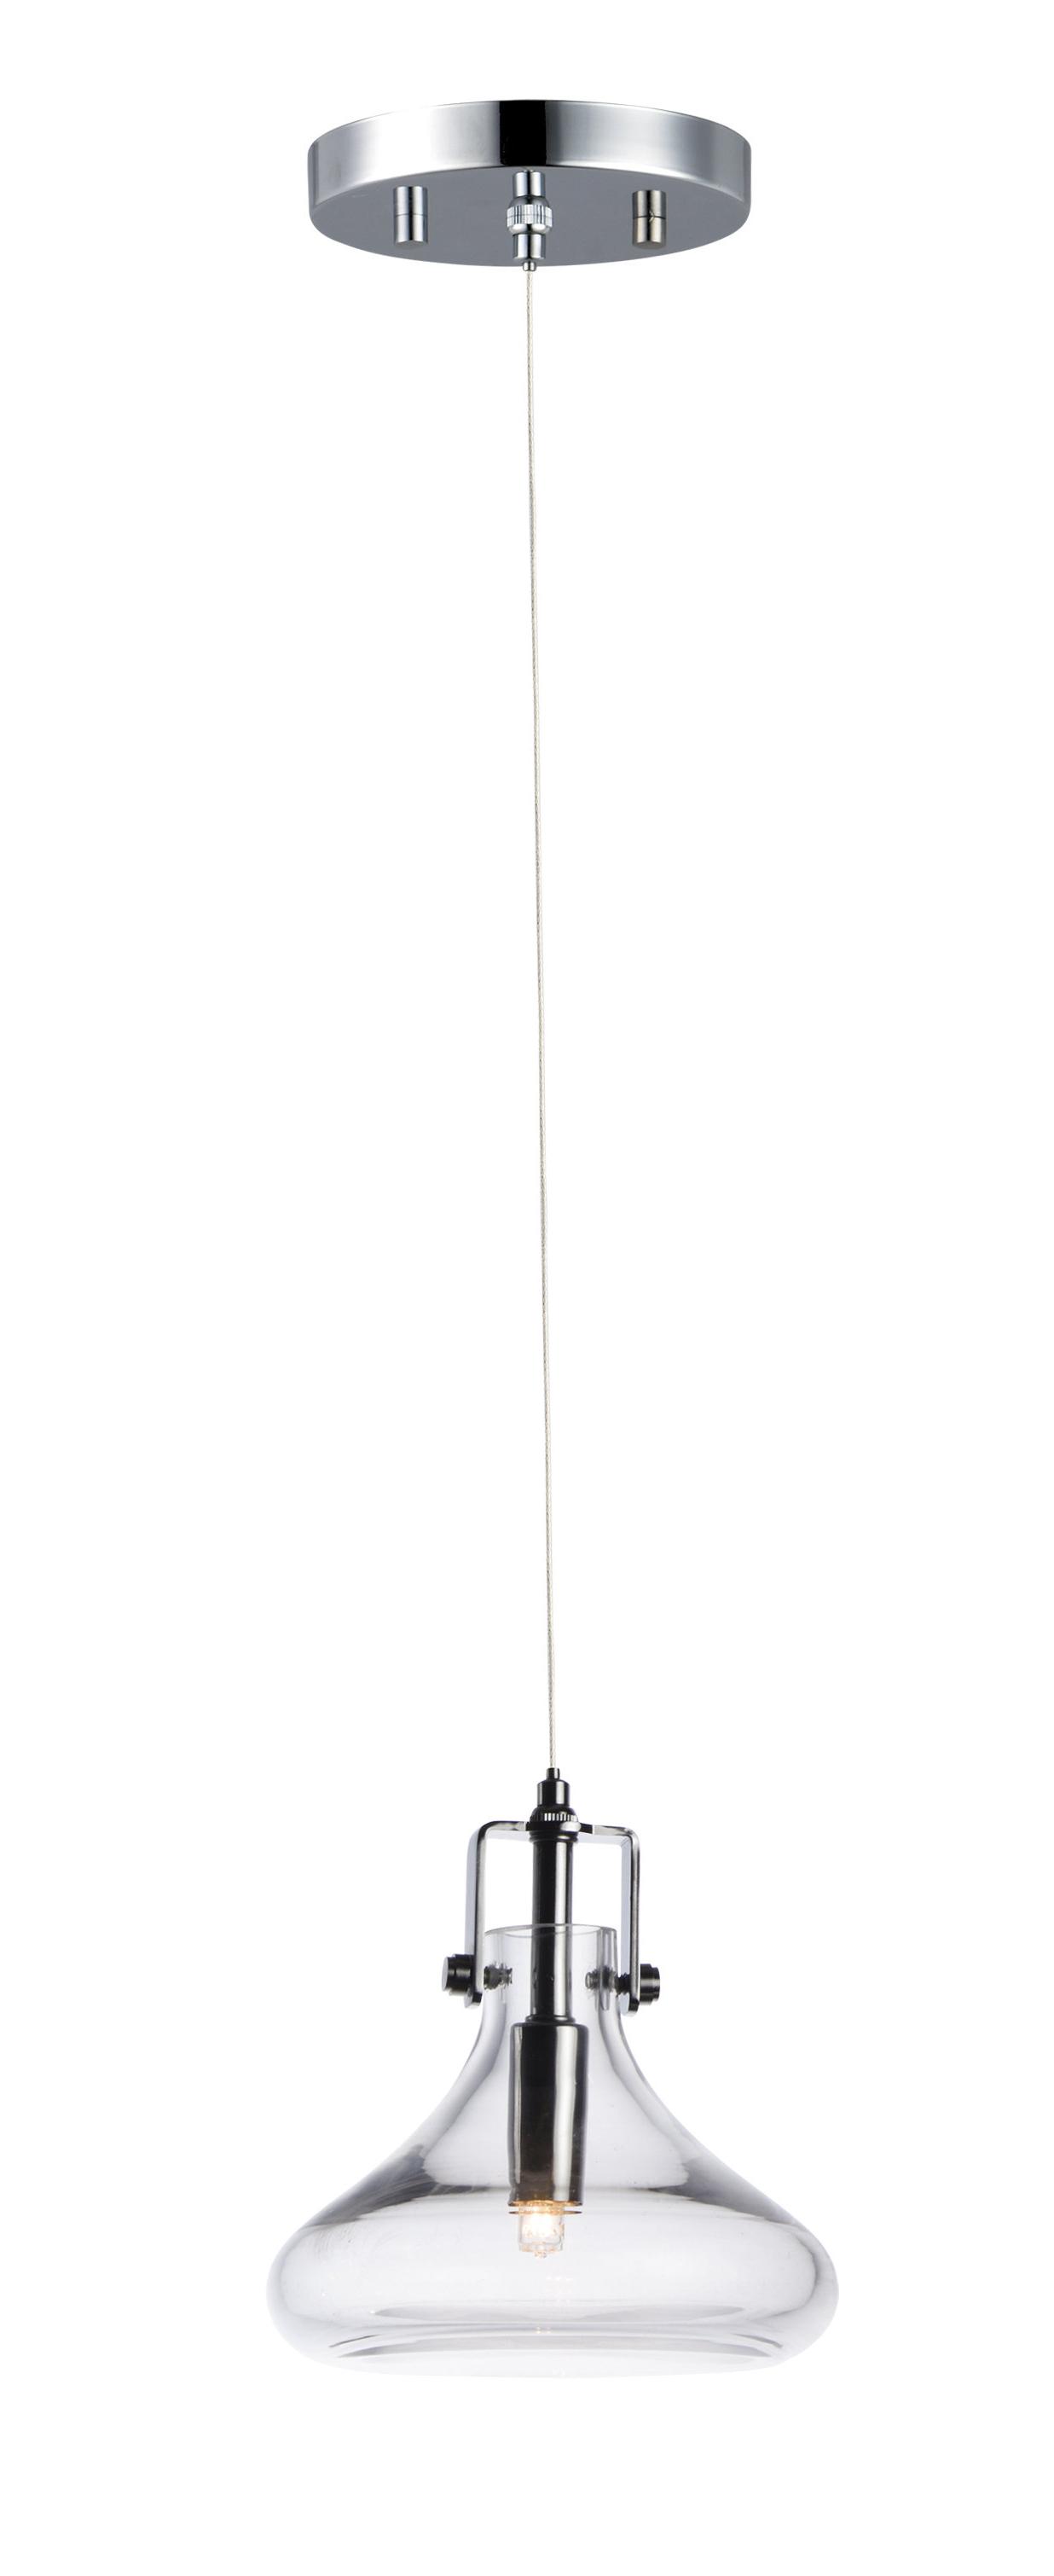 Senger 1 Light Teardrop Pendant Pertaining To Preferred Kimsey 1 Light Teardrop Pendants (View 18 of 20)